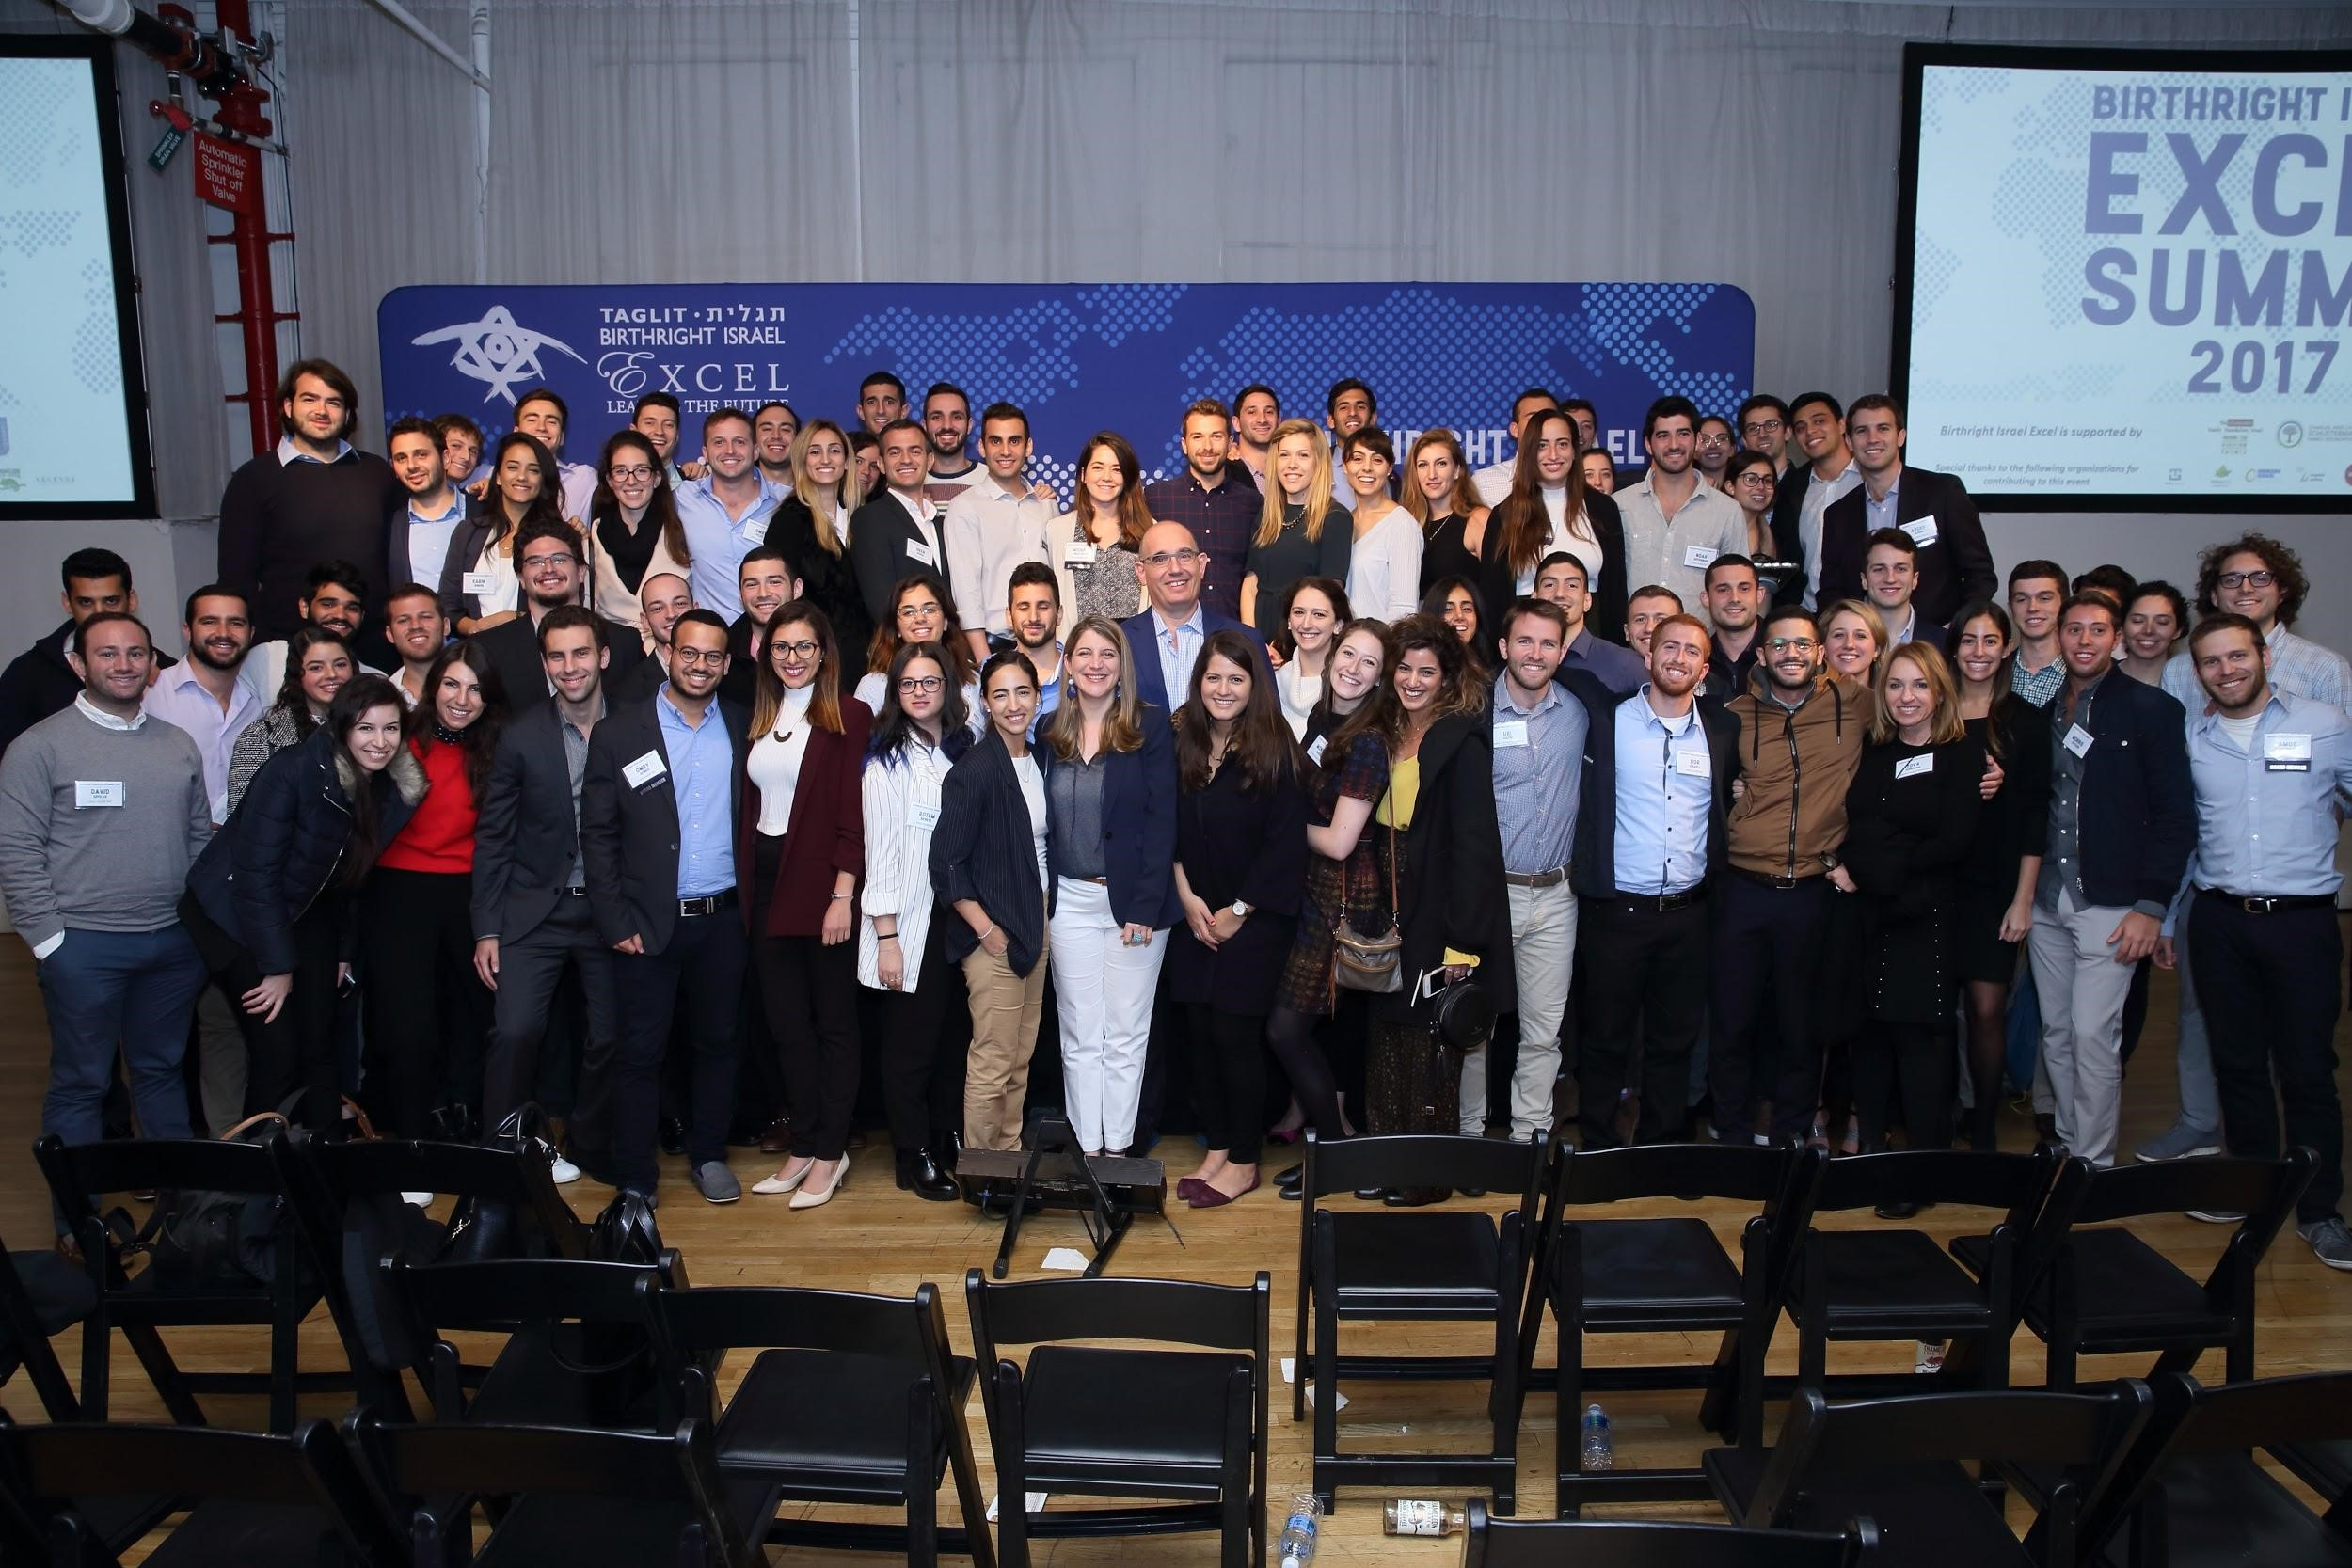 Excel Summit 2017